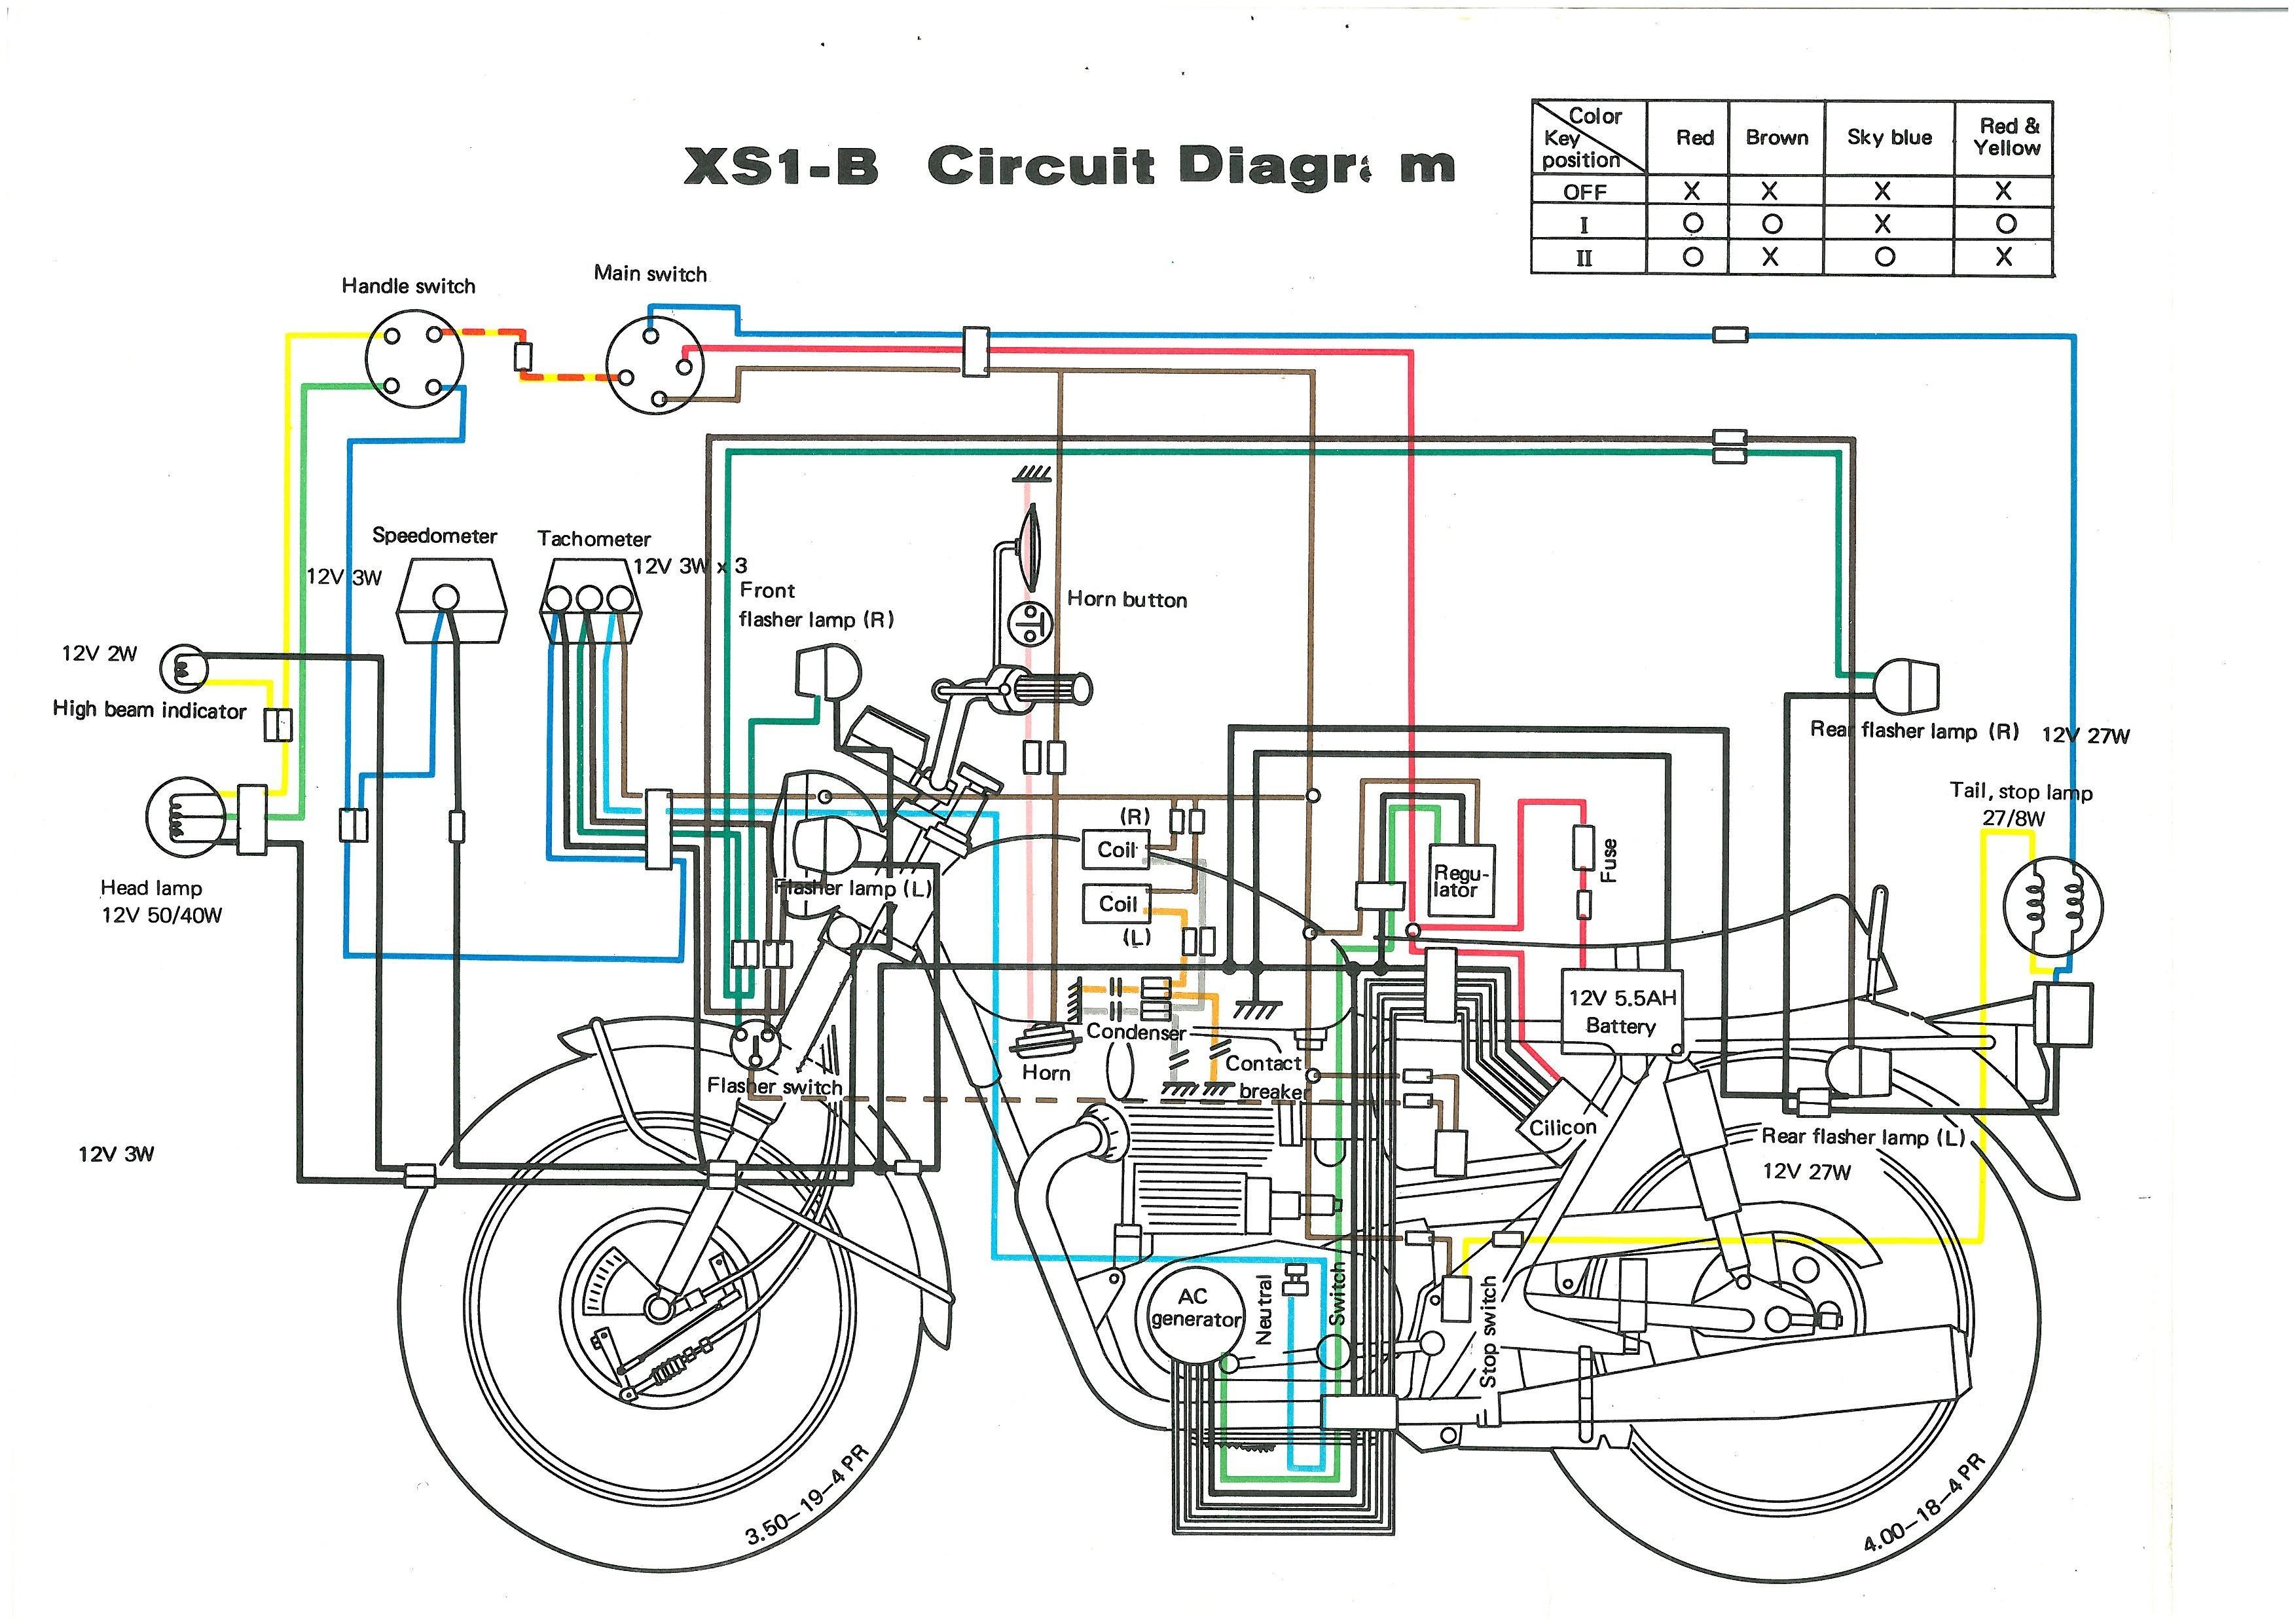 1980 yamaha xs850 wiring diagram - wiring diagram motor -  motor.frankmotors.es  frank motors